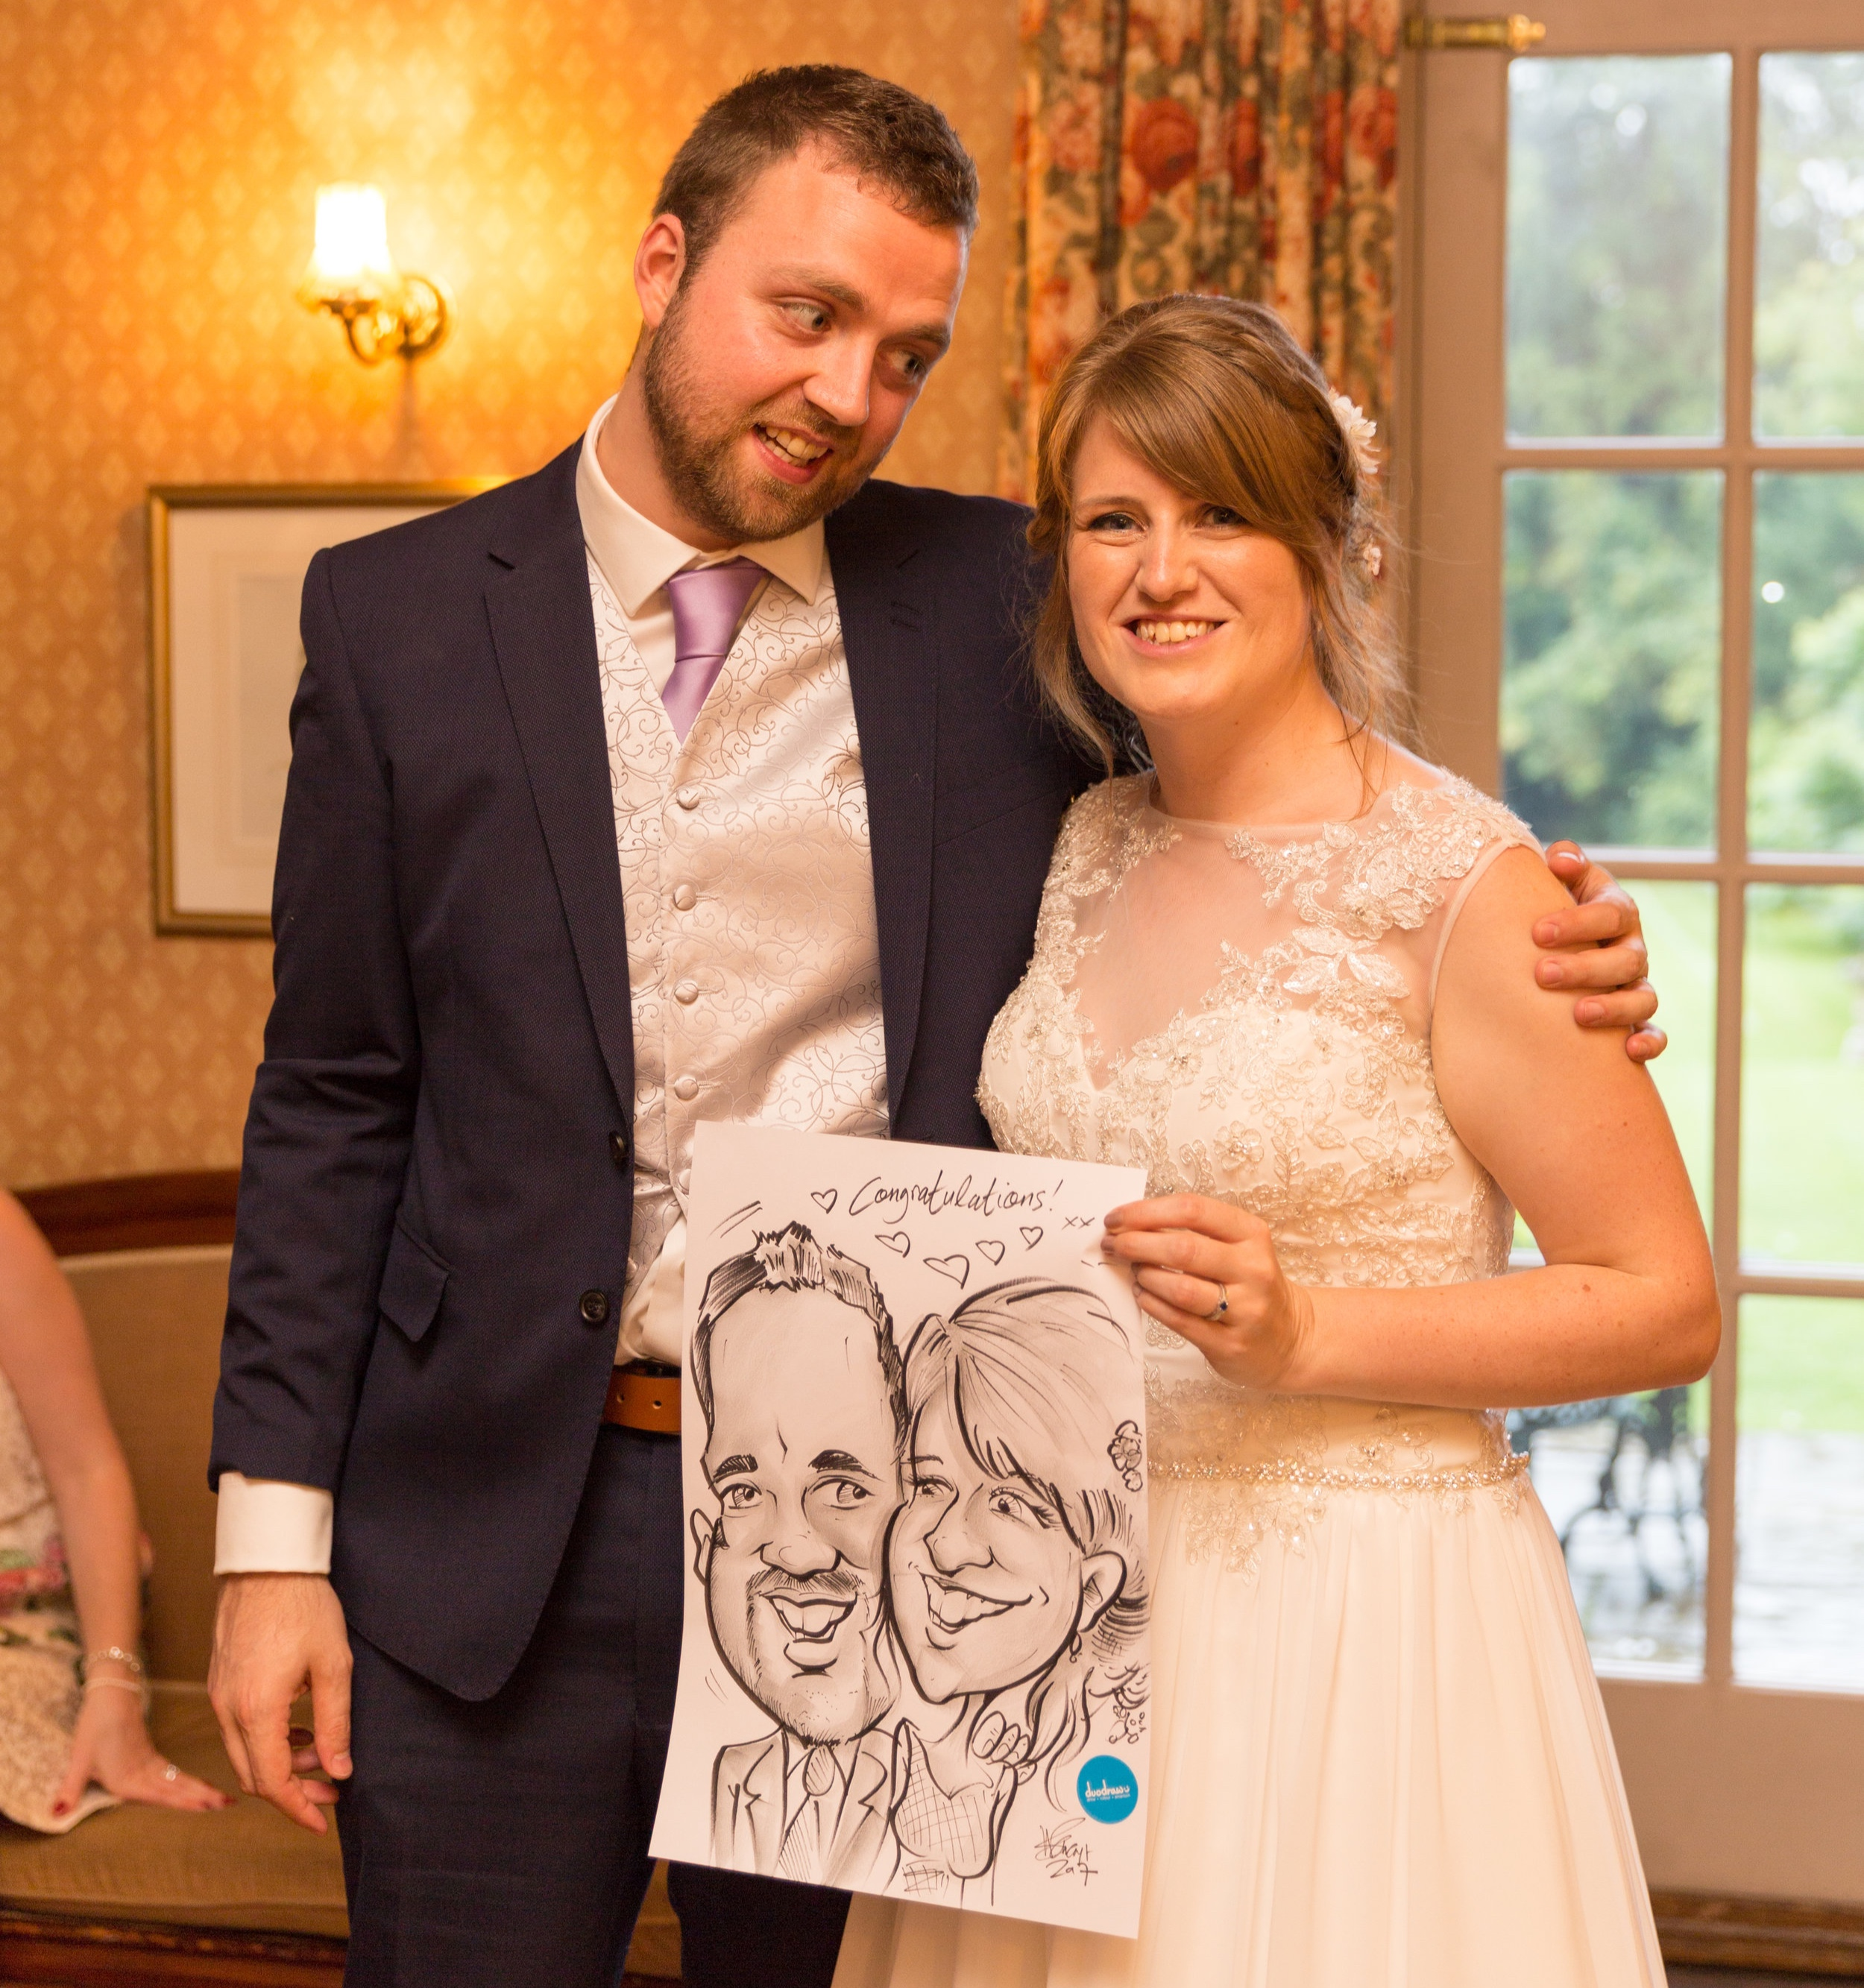 wedding-caricature-couple.jpg